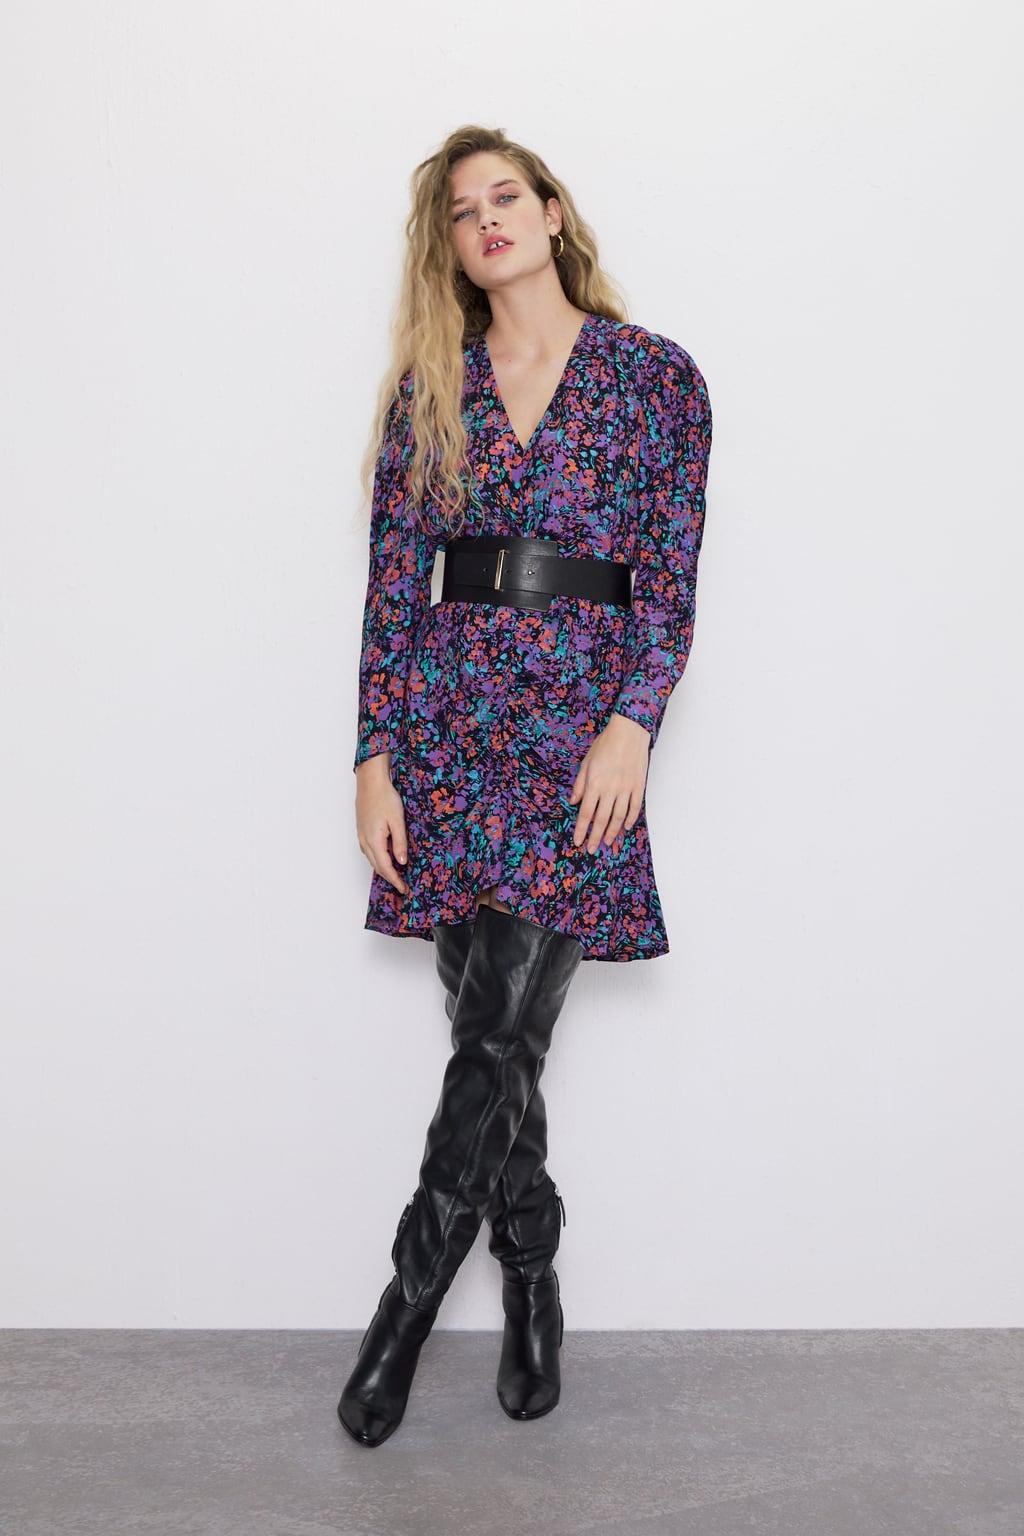 To 80s φόρεμα της Ζέτας Μακρυπούλια είναι το πιο hot trend της σεζόν